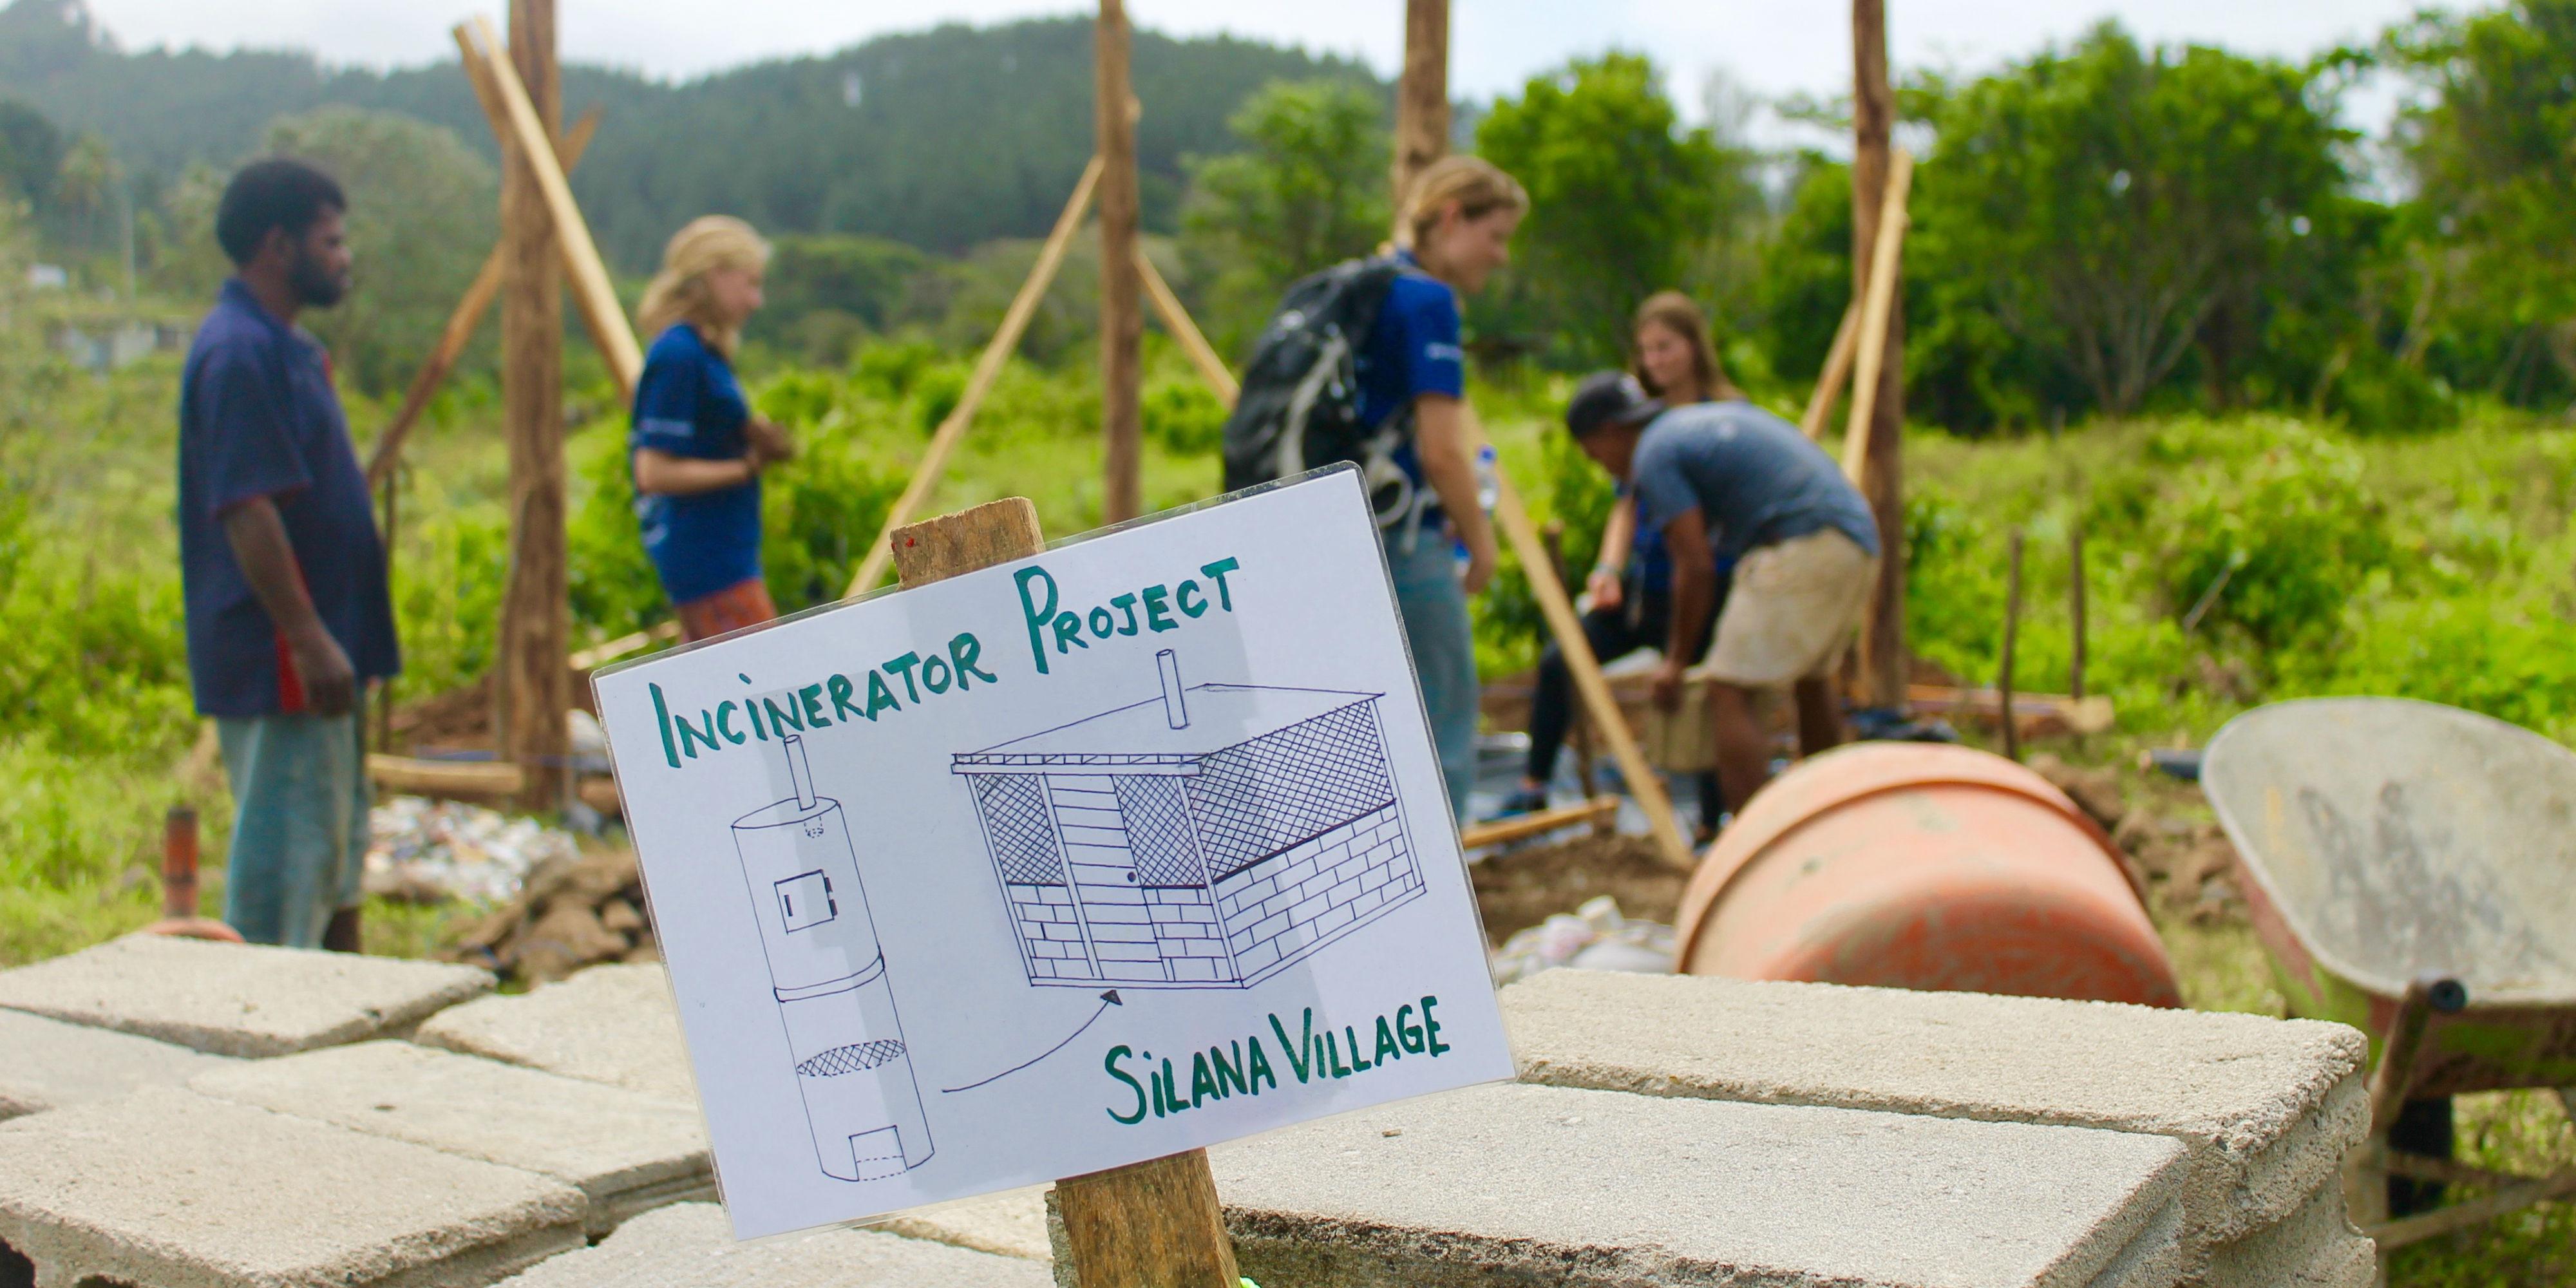 sustainable volunteering